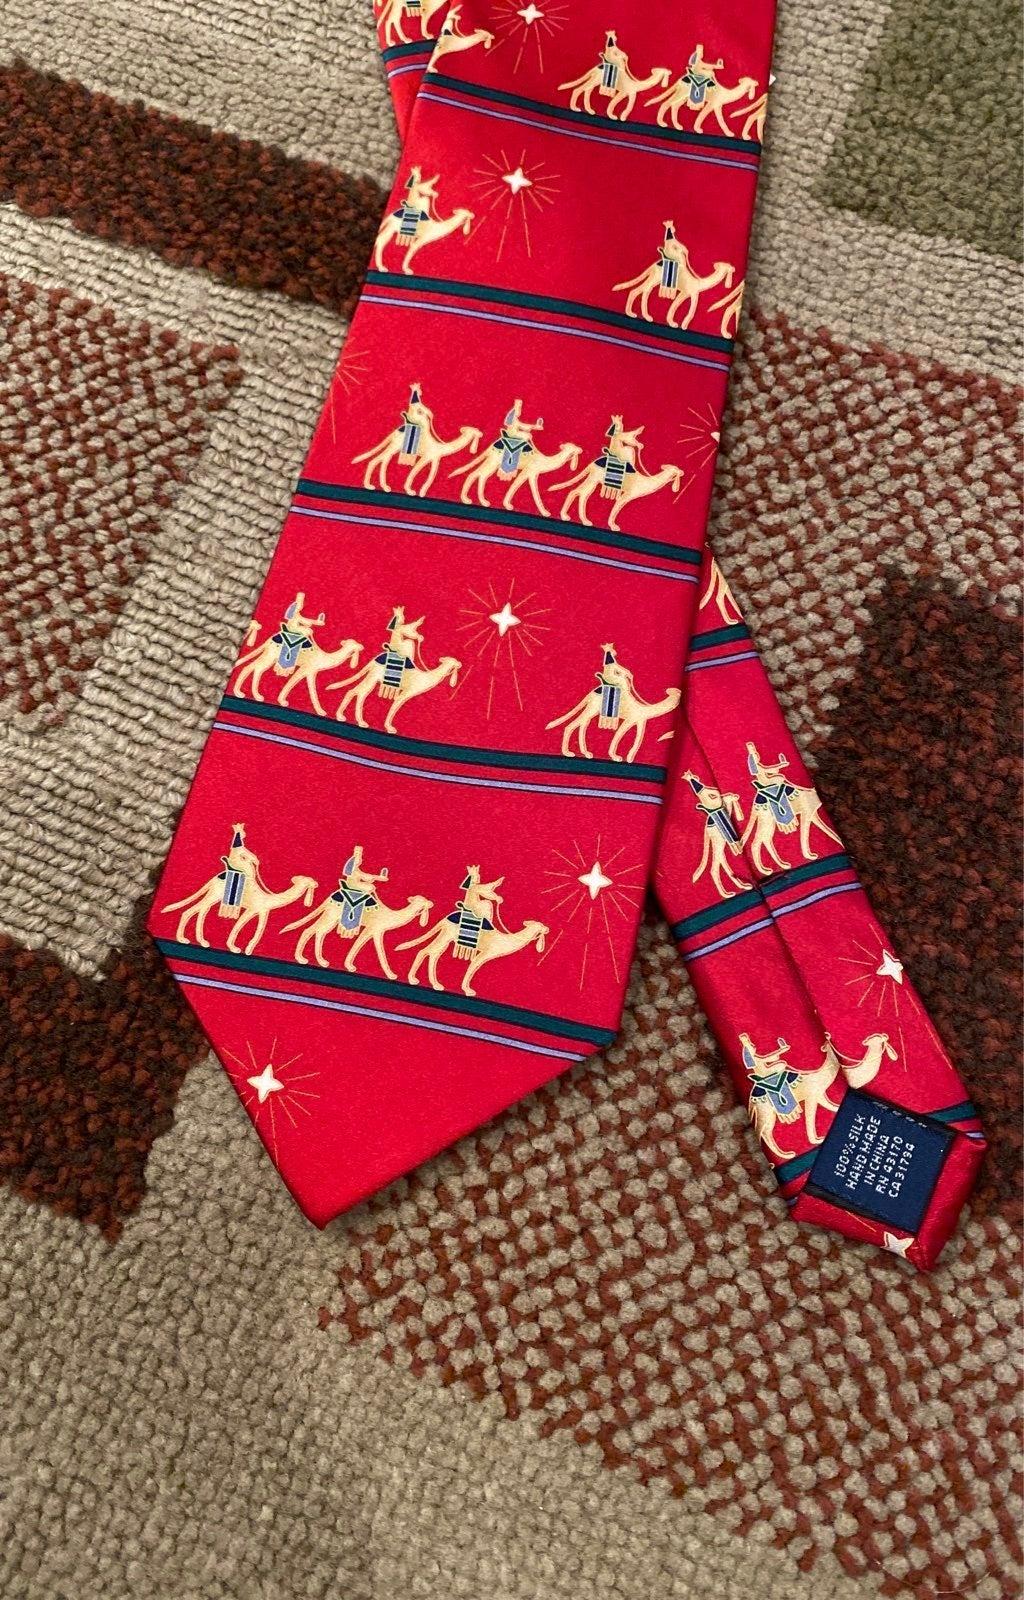 Traditional Christmas tie NWT